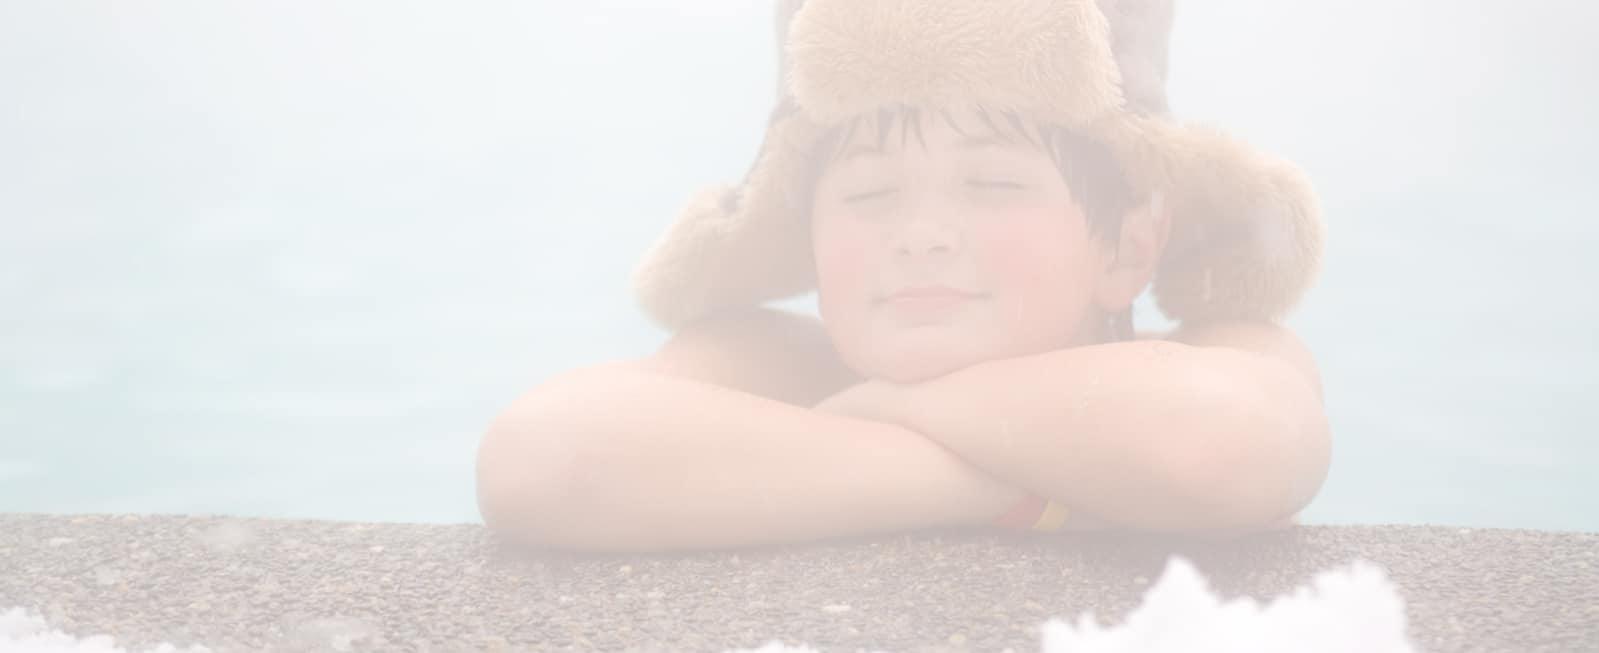 Hot Tub Dealers Tucson >> Arctic Spas Hot Tubs